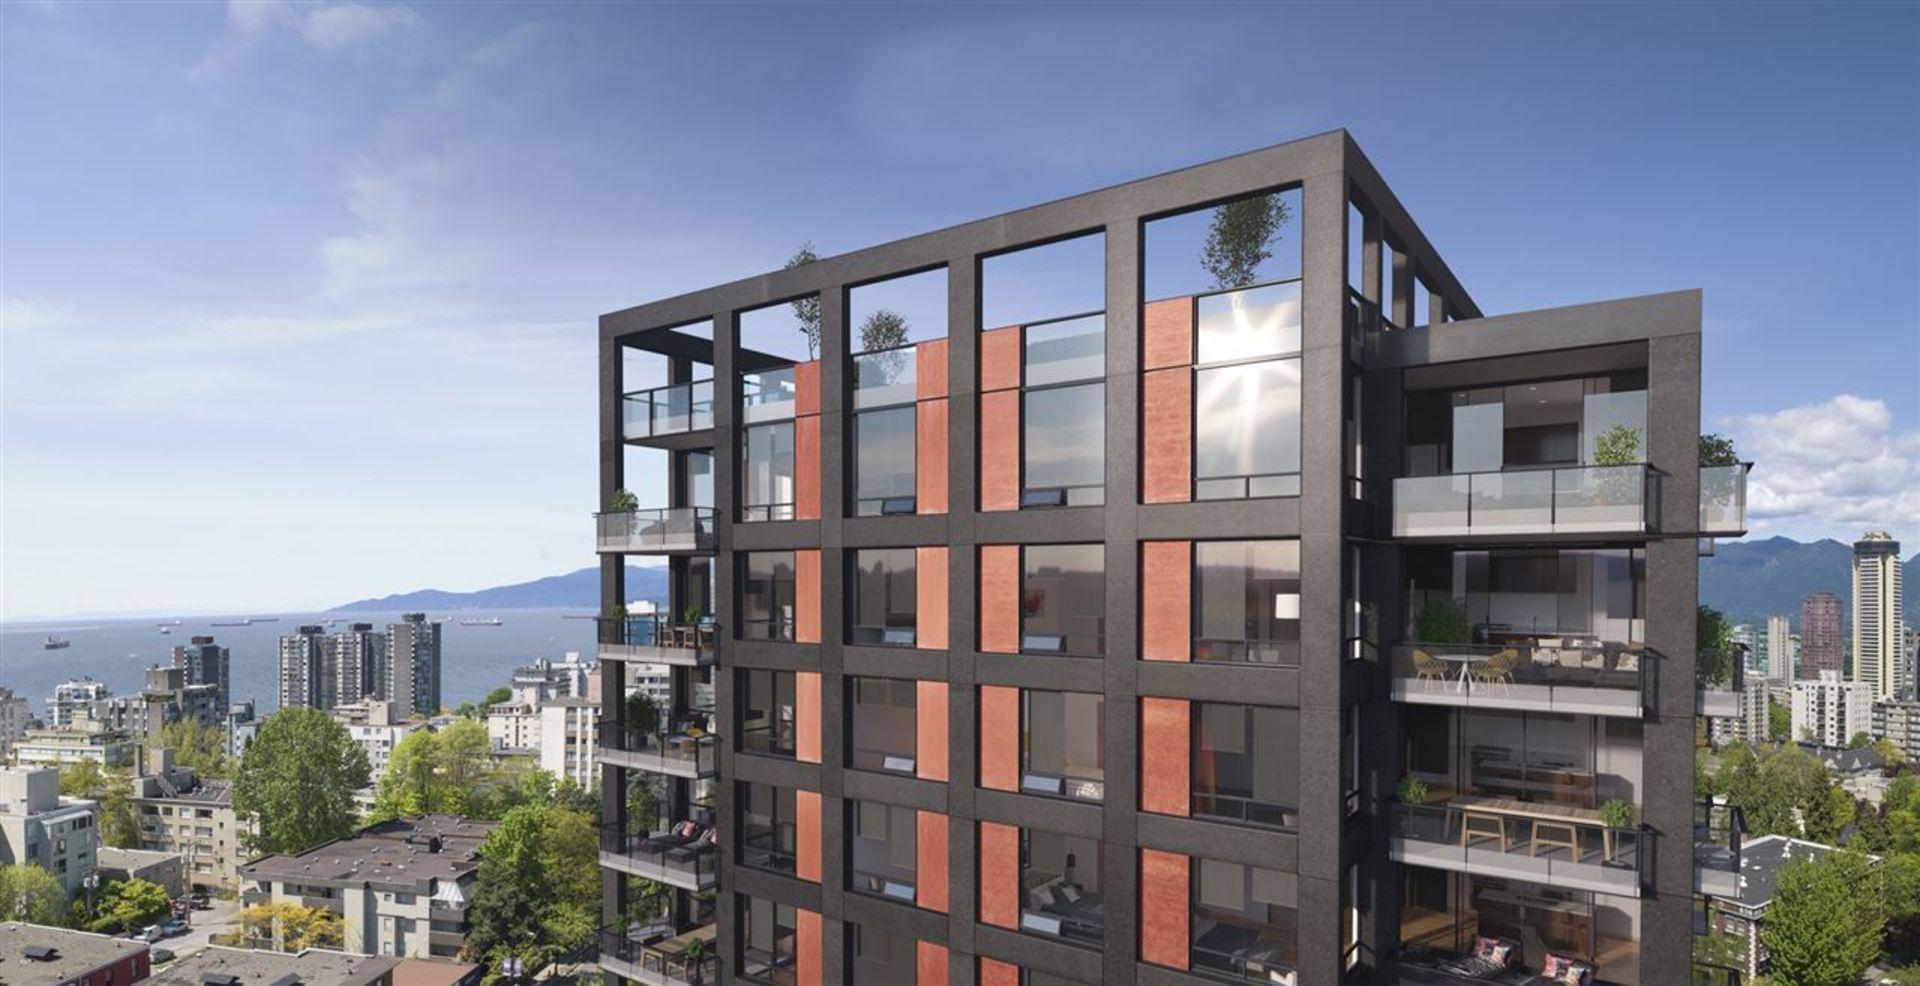 1171-jervis-street-west-end-vw-vancouver-west-01 at 701 - 1171 Jervis Street, West End VW, Vancouver West